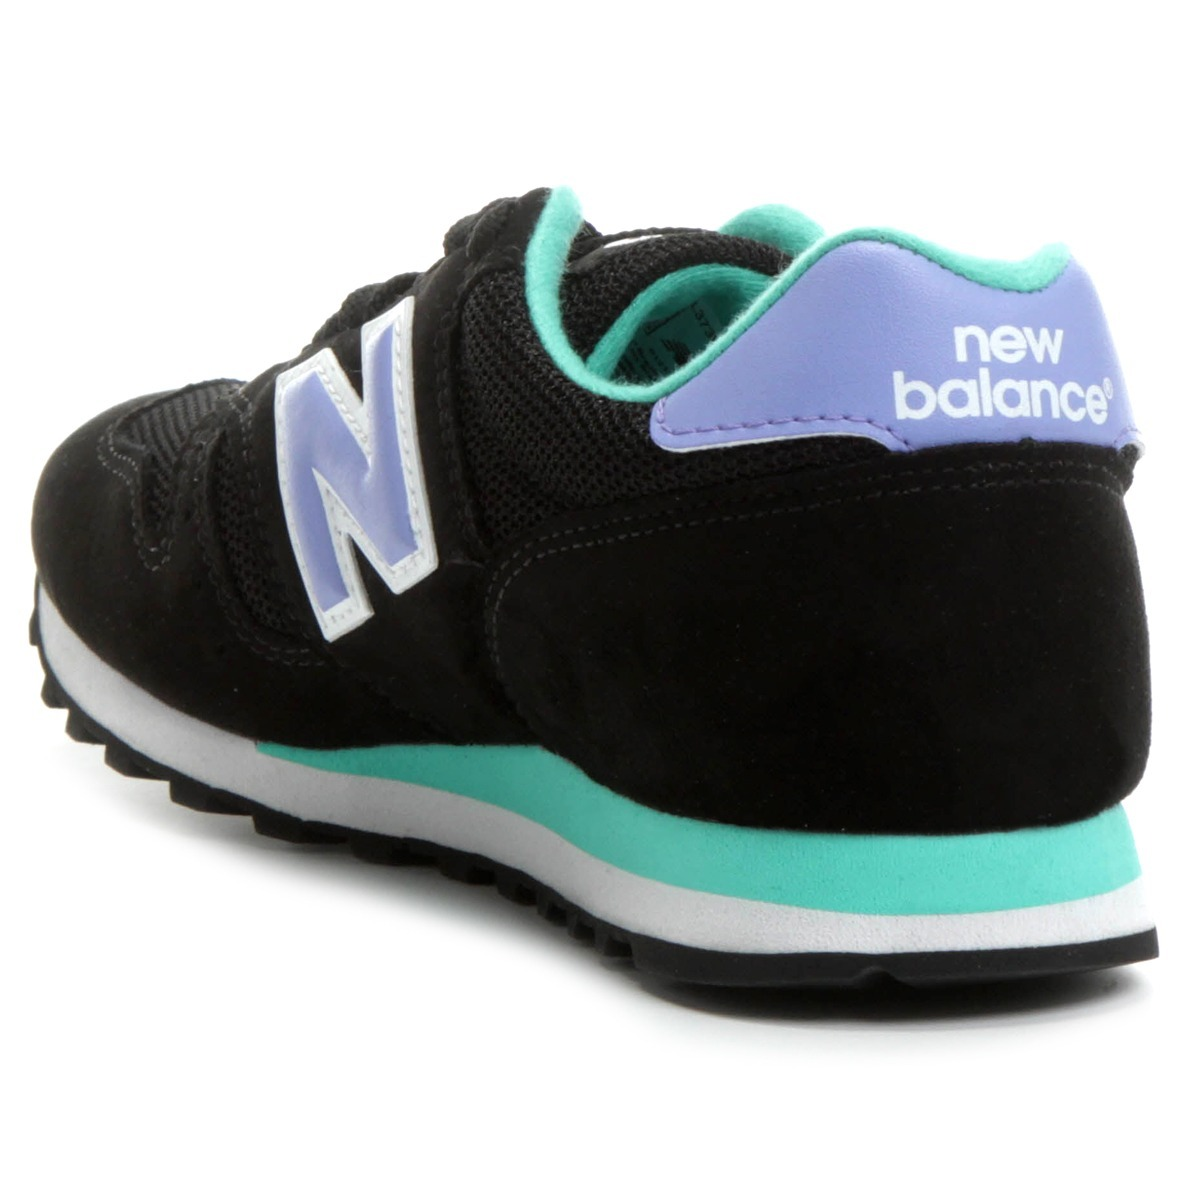 373 new balance mujer negras